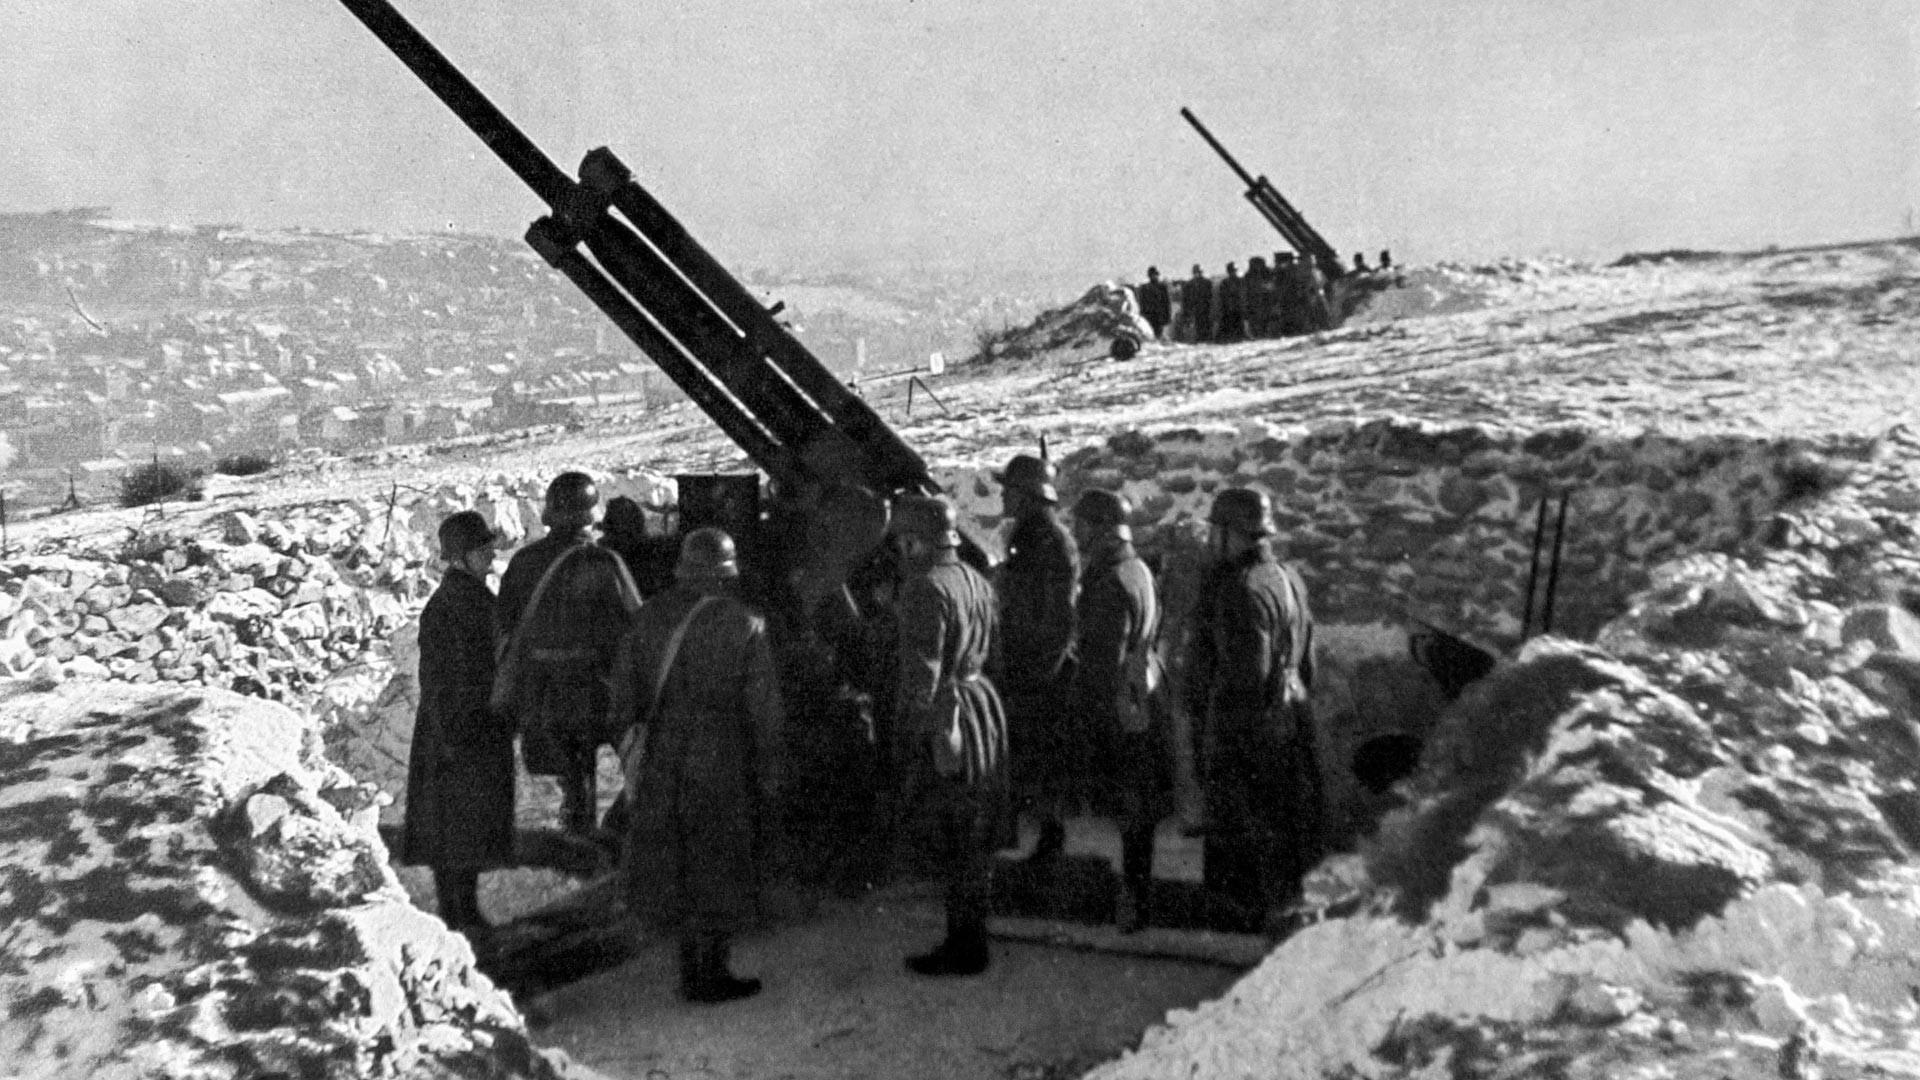 Drugi svjetski rat. Mađarska vojska čuva Dunav, časopis